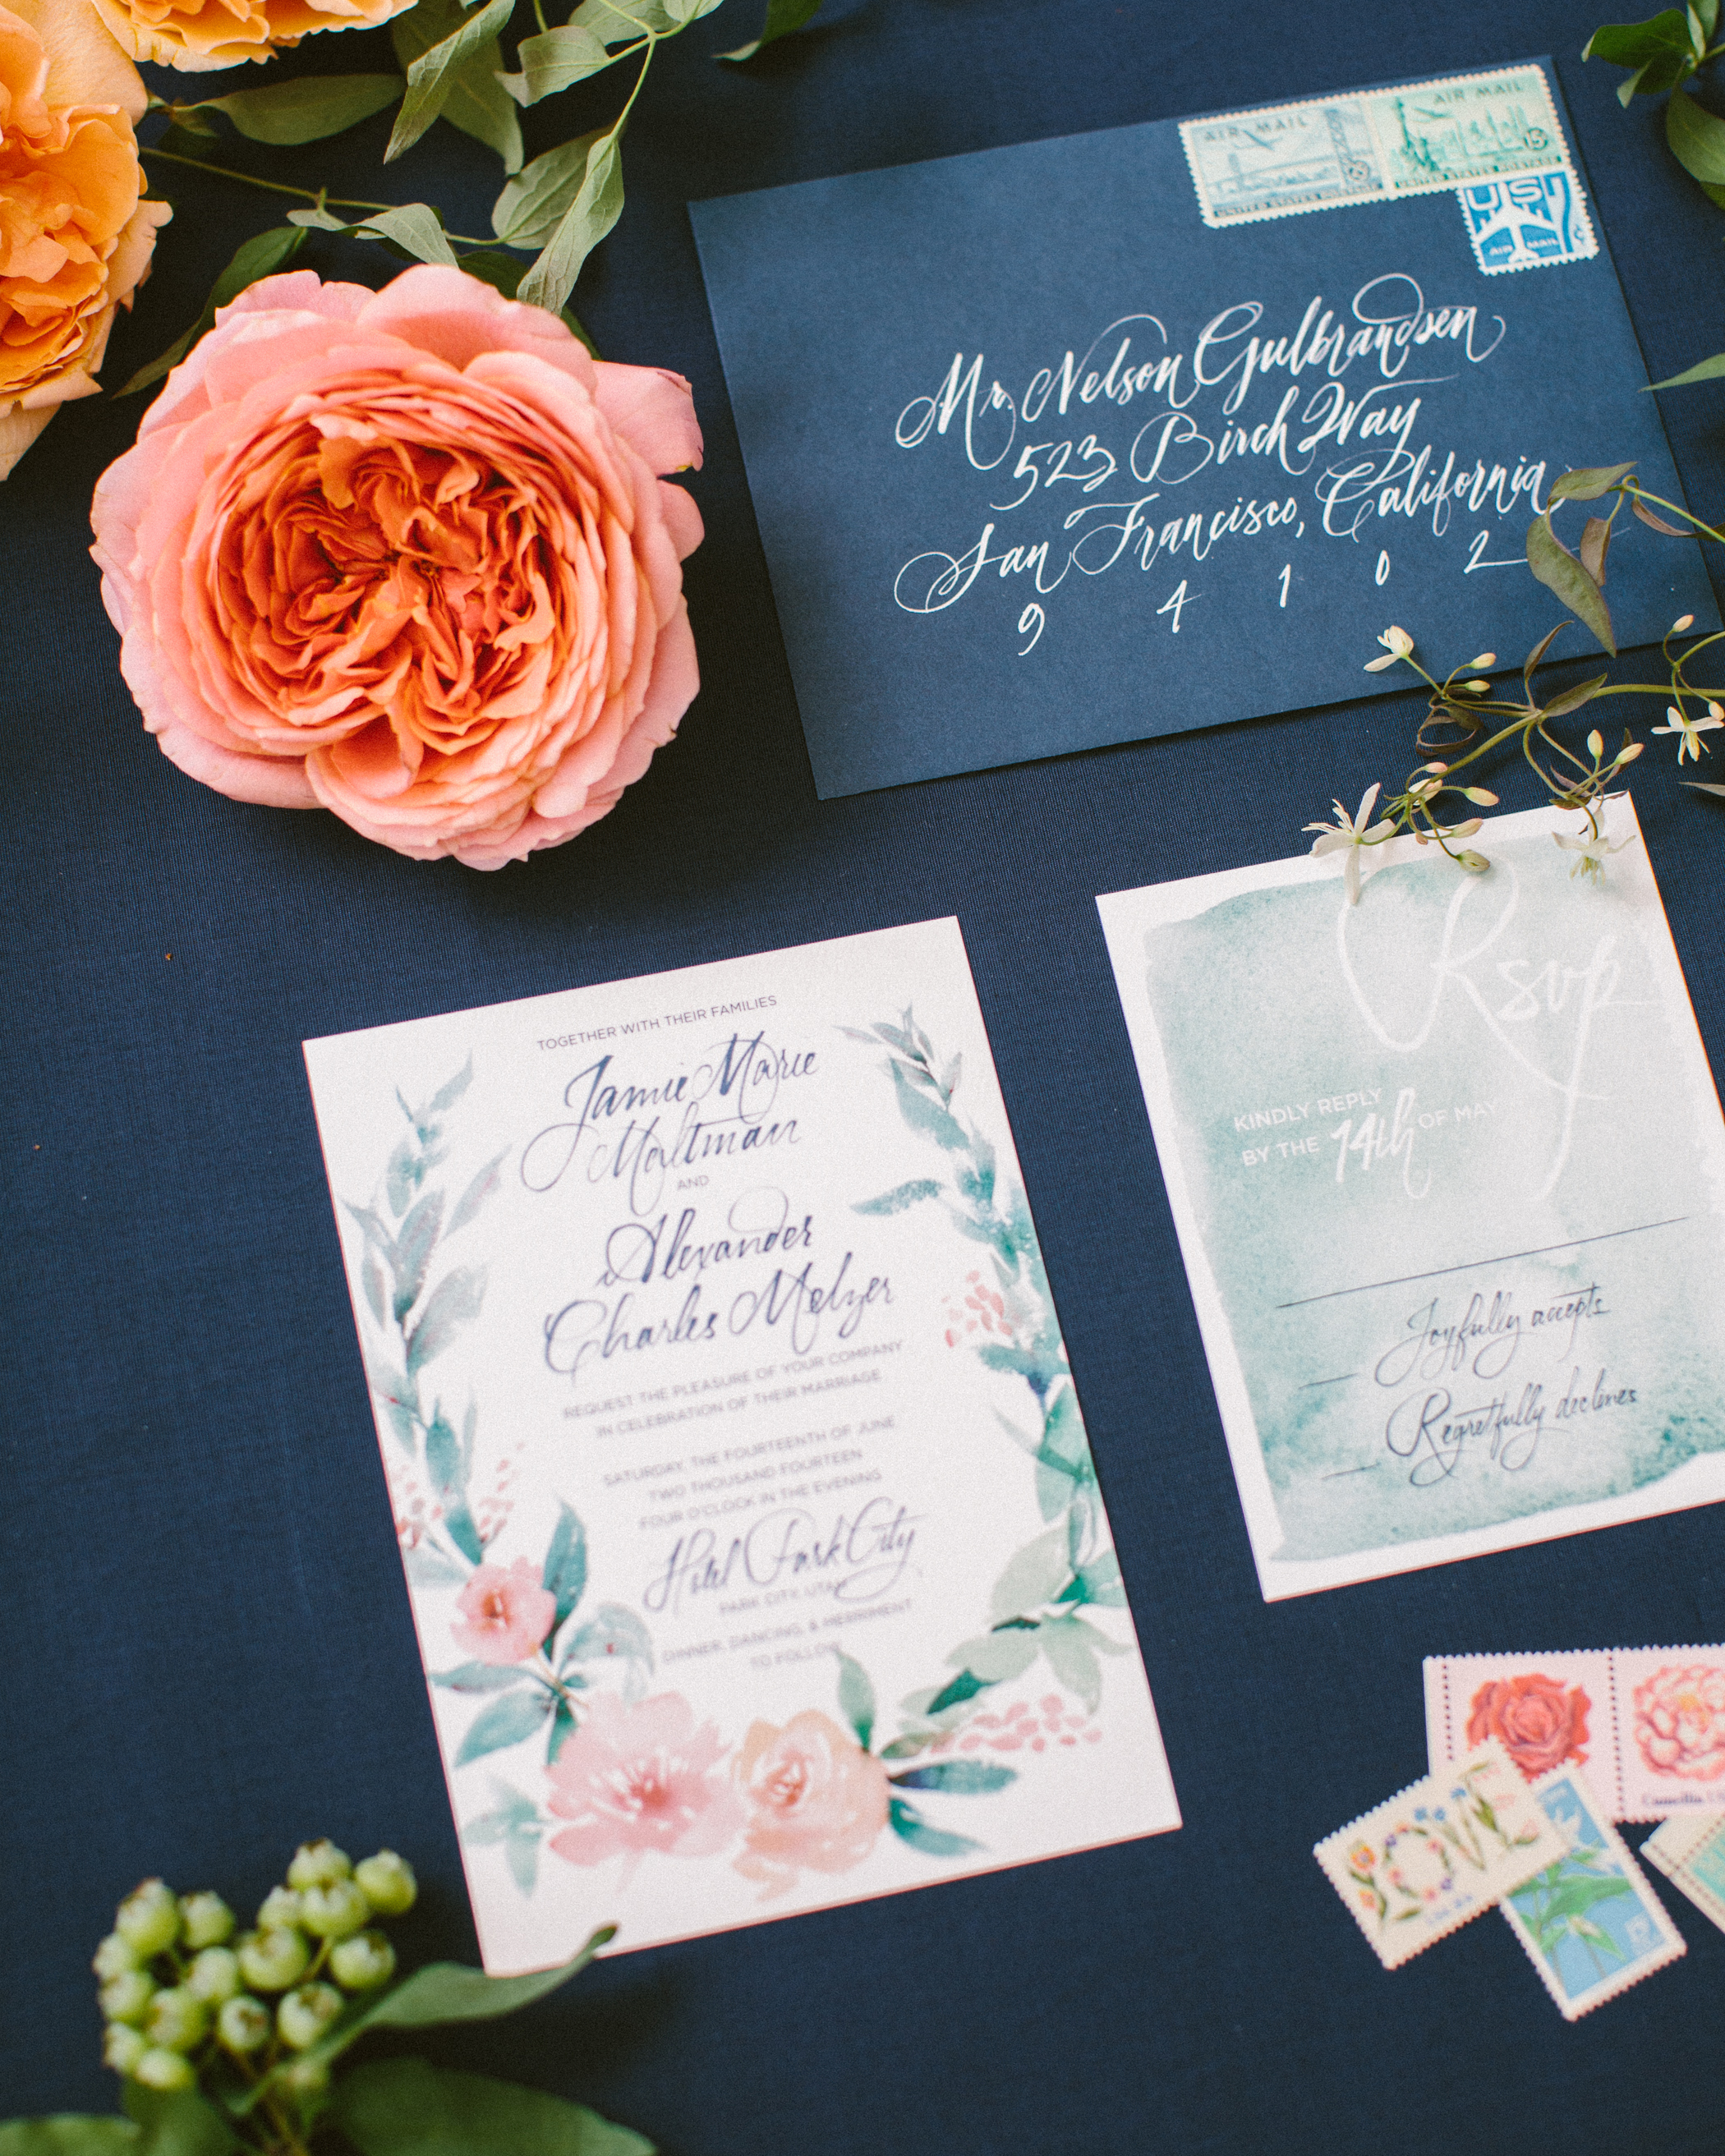 jamie-alex-wedding-invite-127-s111544-1014.jpg